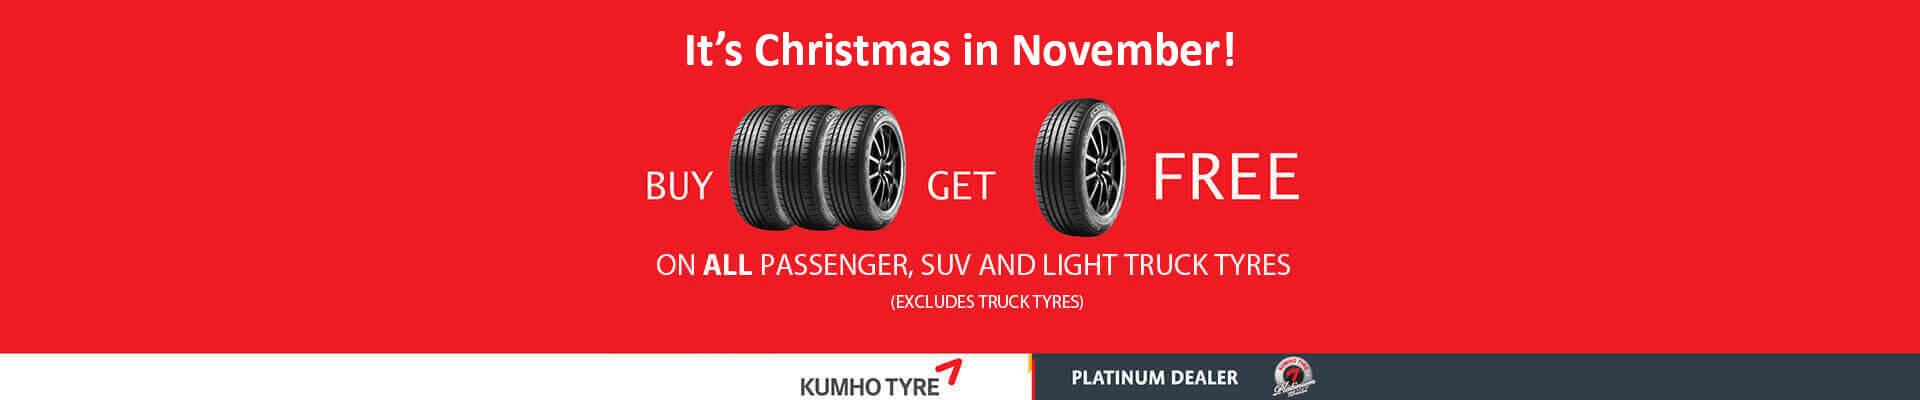 Buy 3 Get 1 Free in November